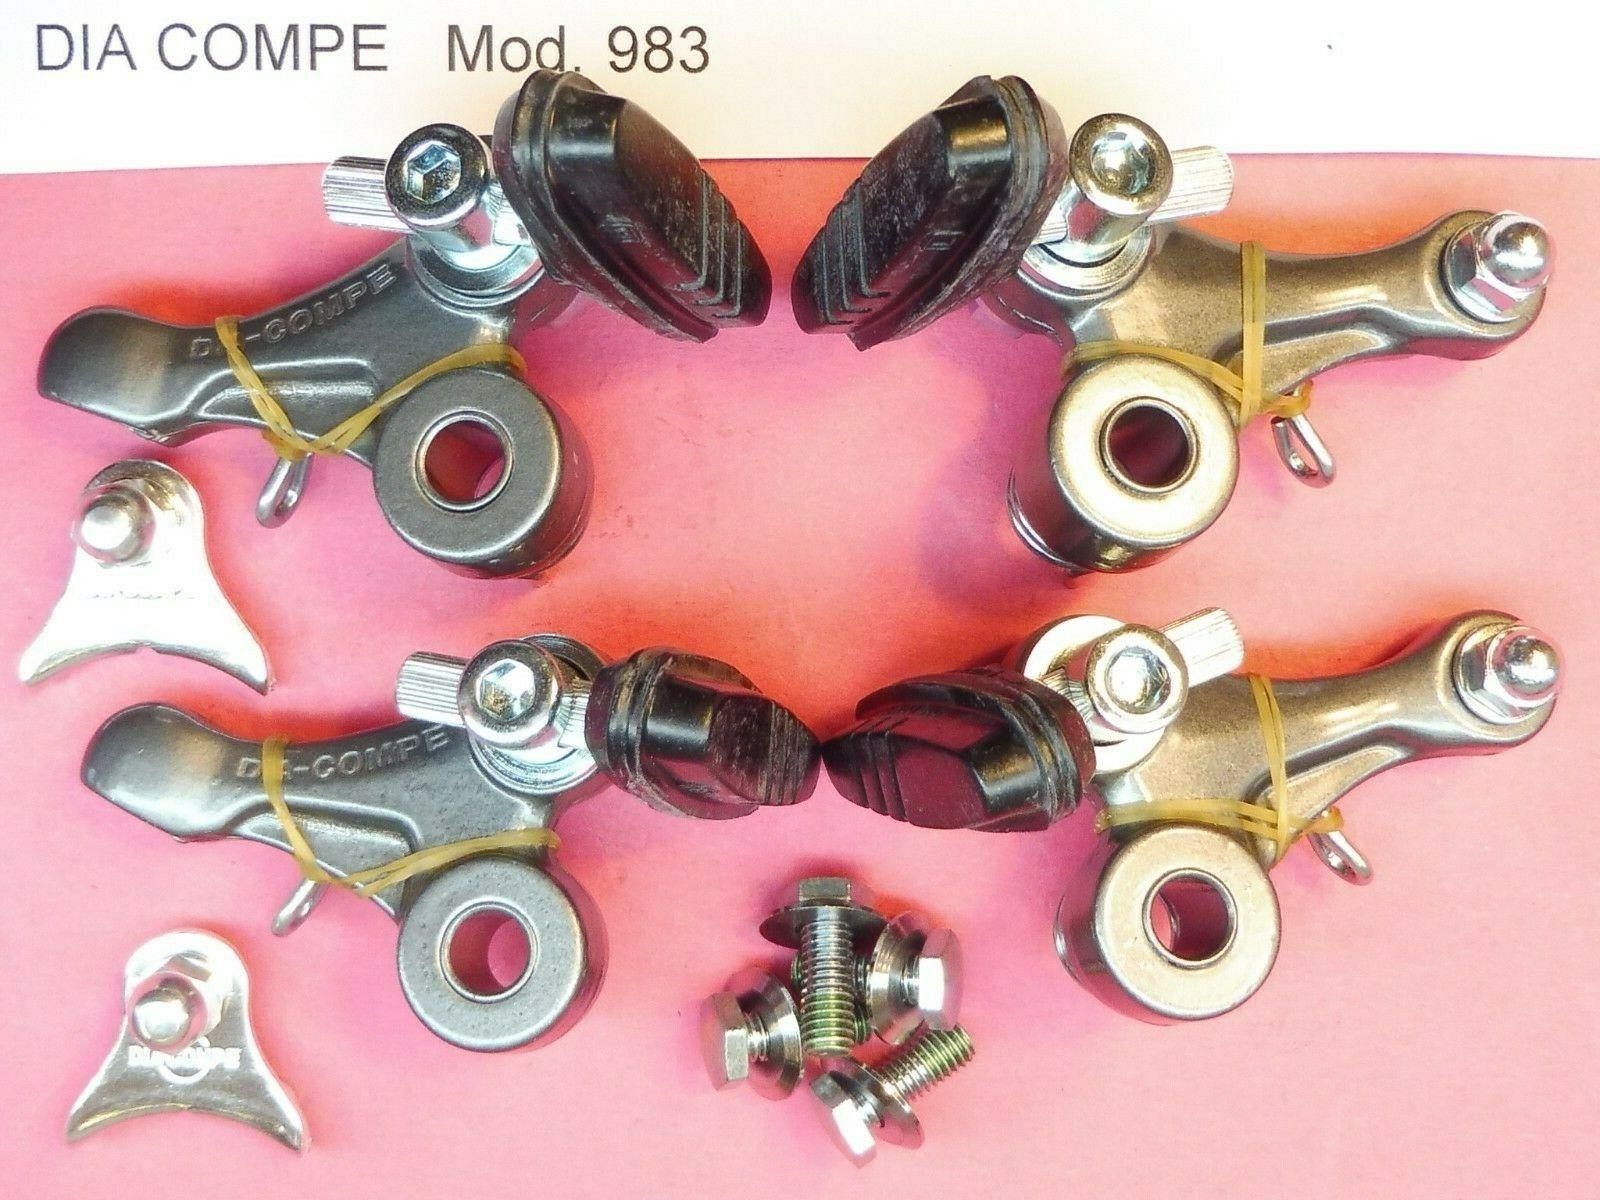 Durchmesser Compe Mod.983 Cantilever Bremsset - Nummern L'Eroica Retro MTB